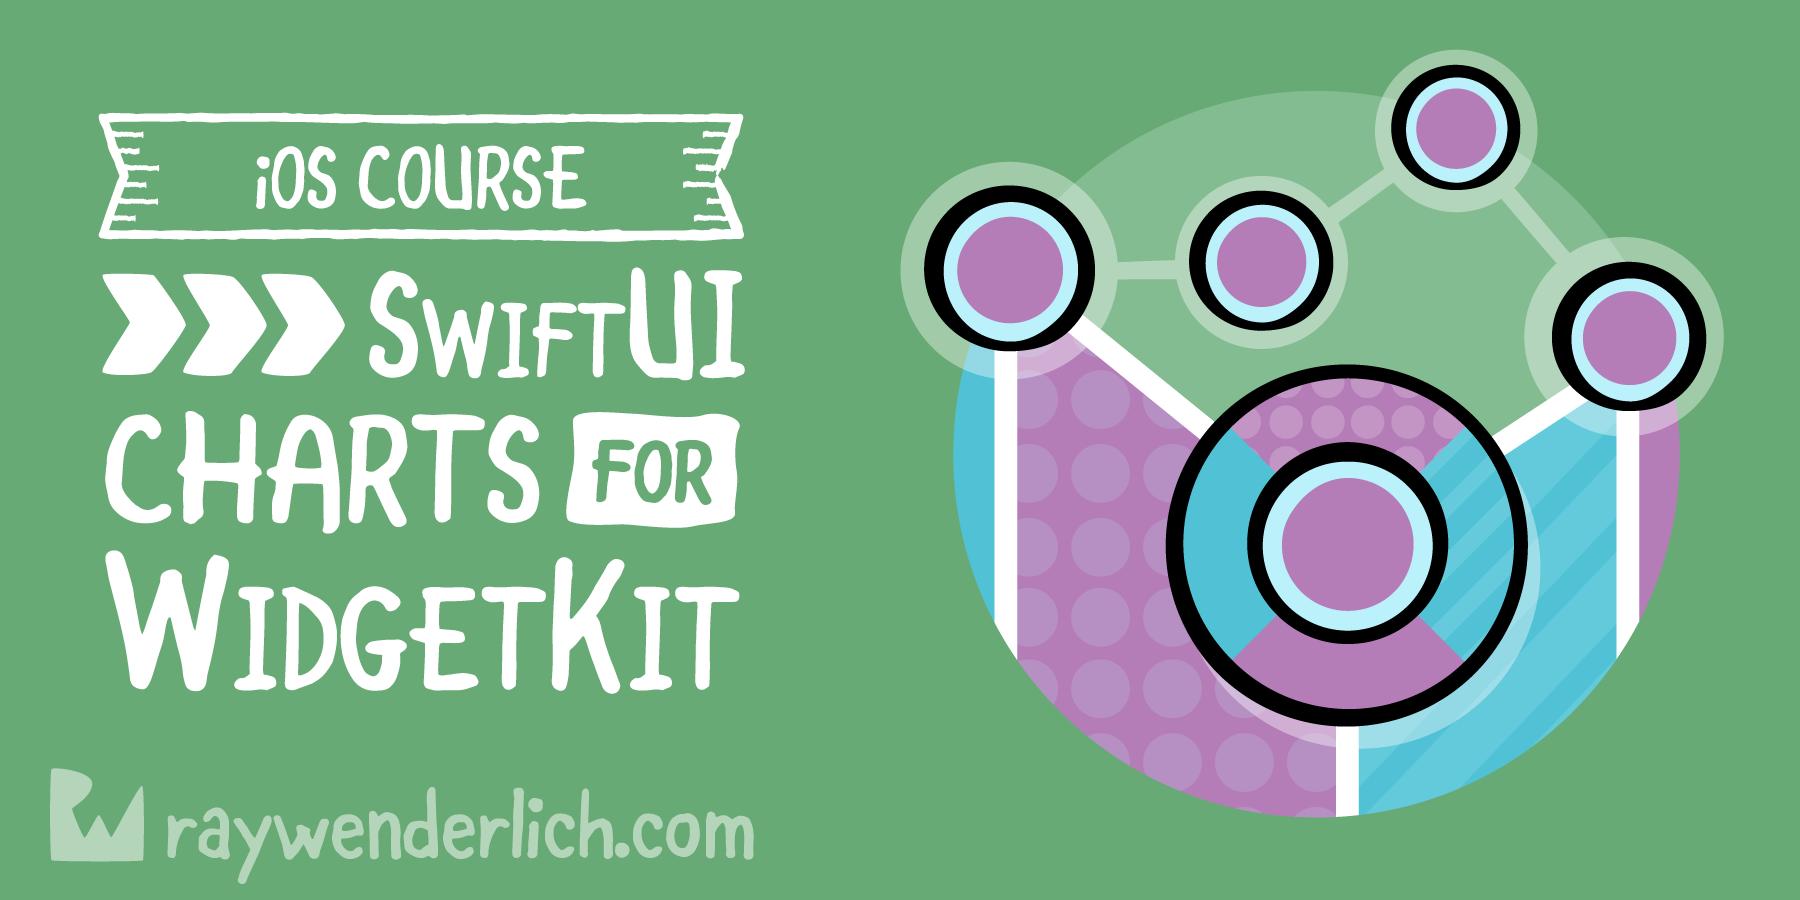 SwiftUI Charts for WidgetKit [SUBSCRIBER]